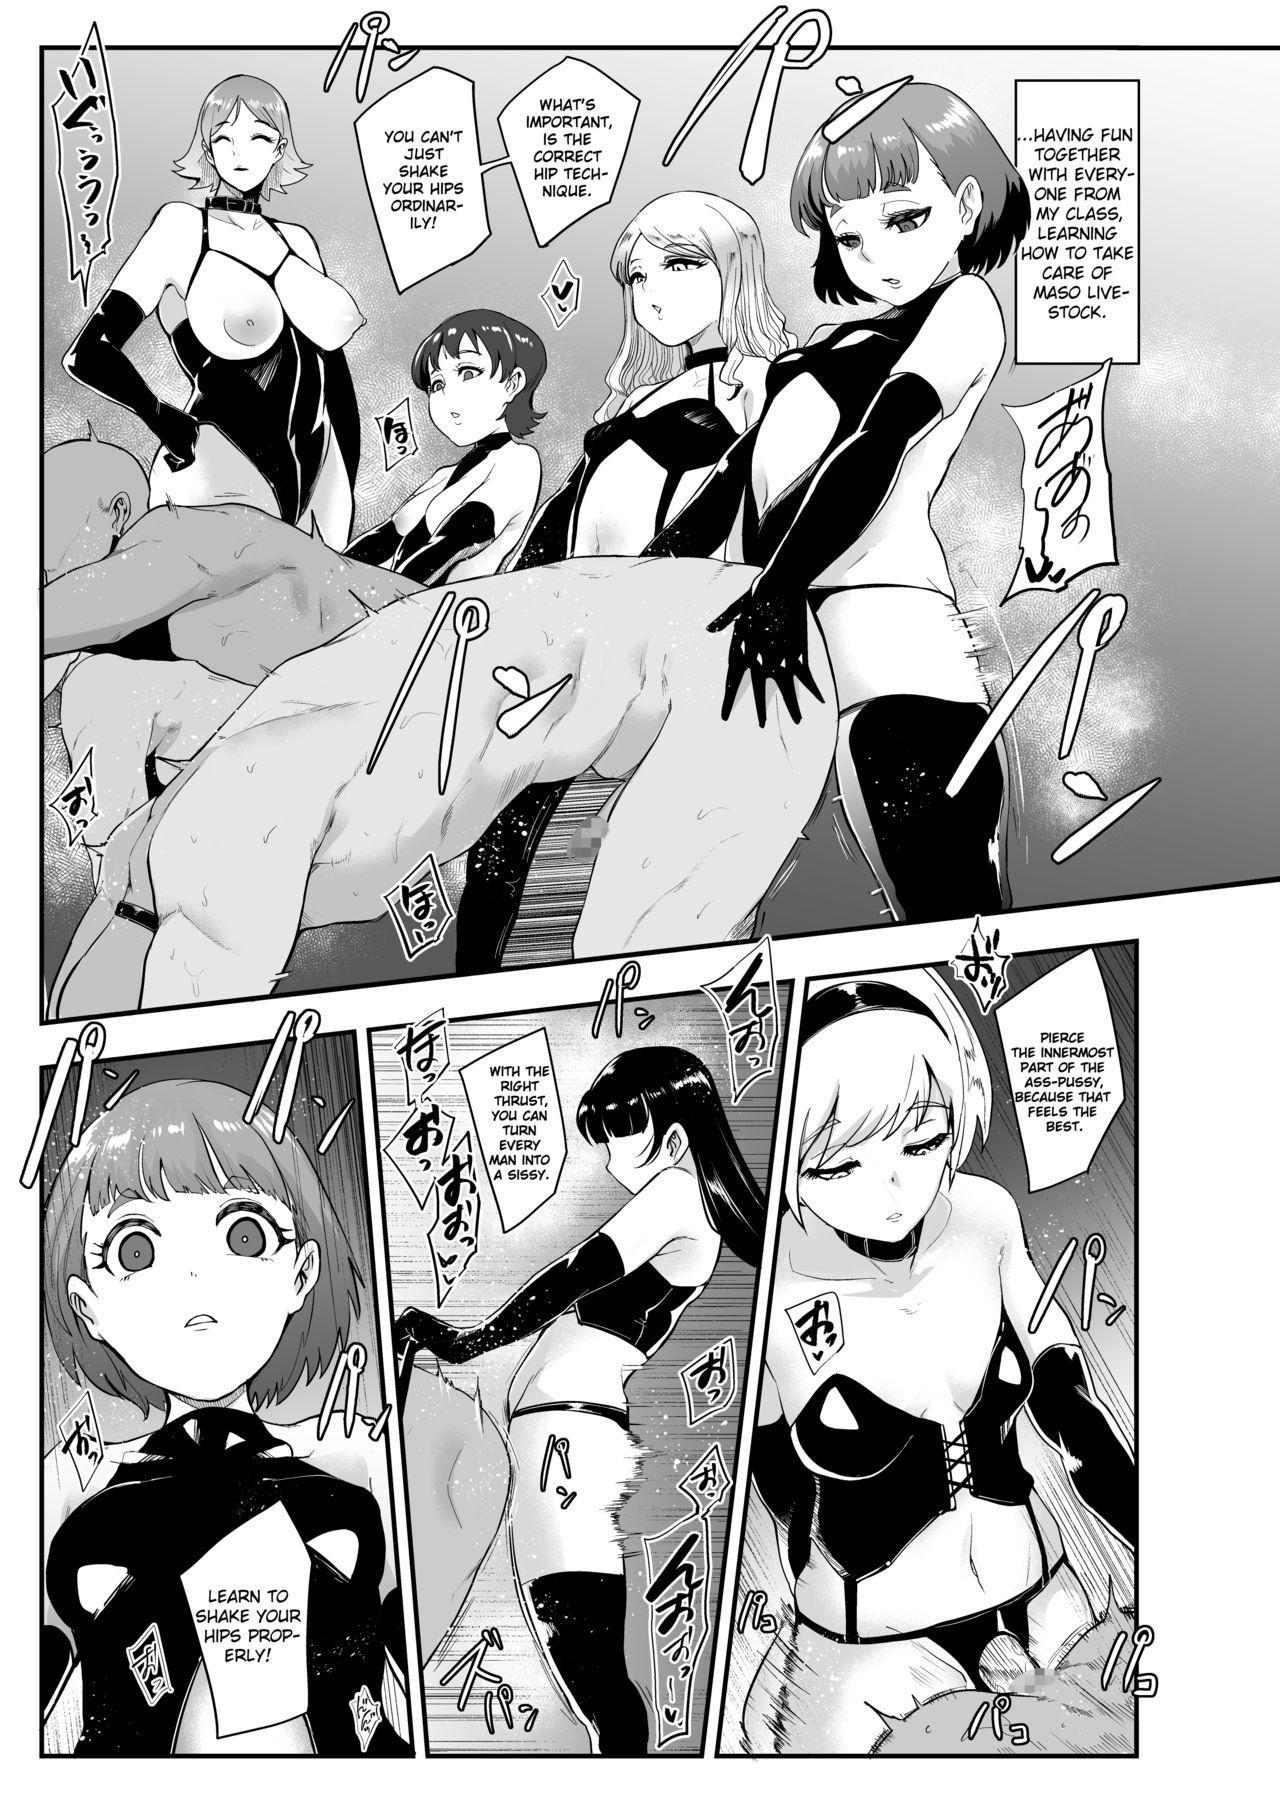 [SOUND MILK (Otochichi)] S Gakuen ~Ojou-sama-tachi no Maso Otoko Choukyou~ | S Academy ~Young Ladies Training Masochistic Men~ [English][QuarantineScans] 5